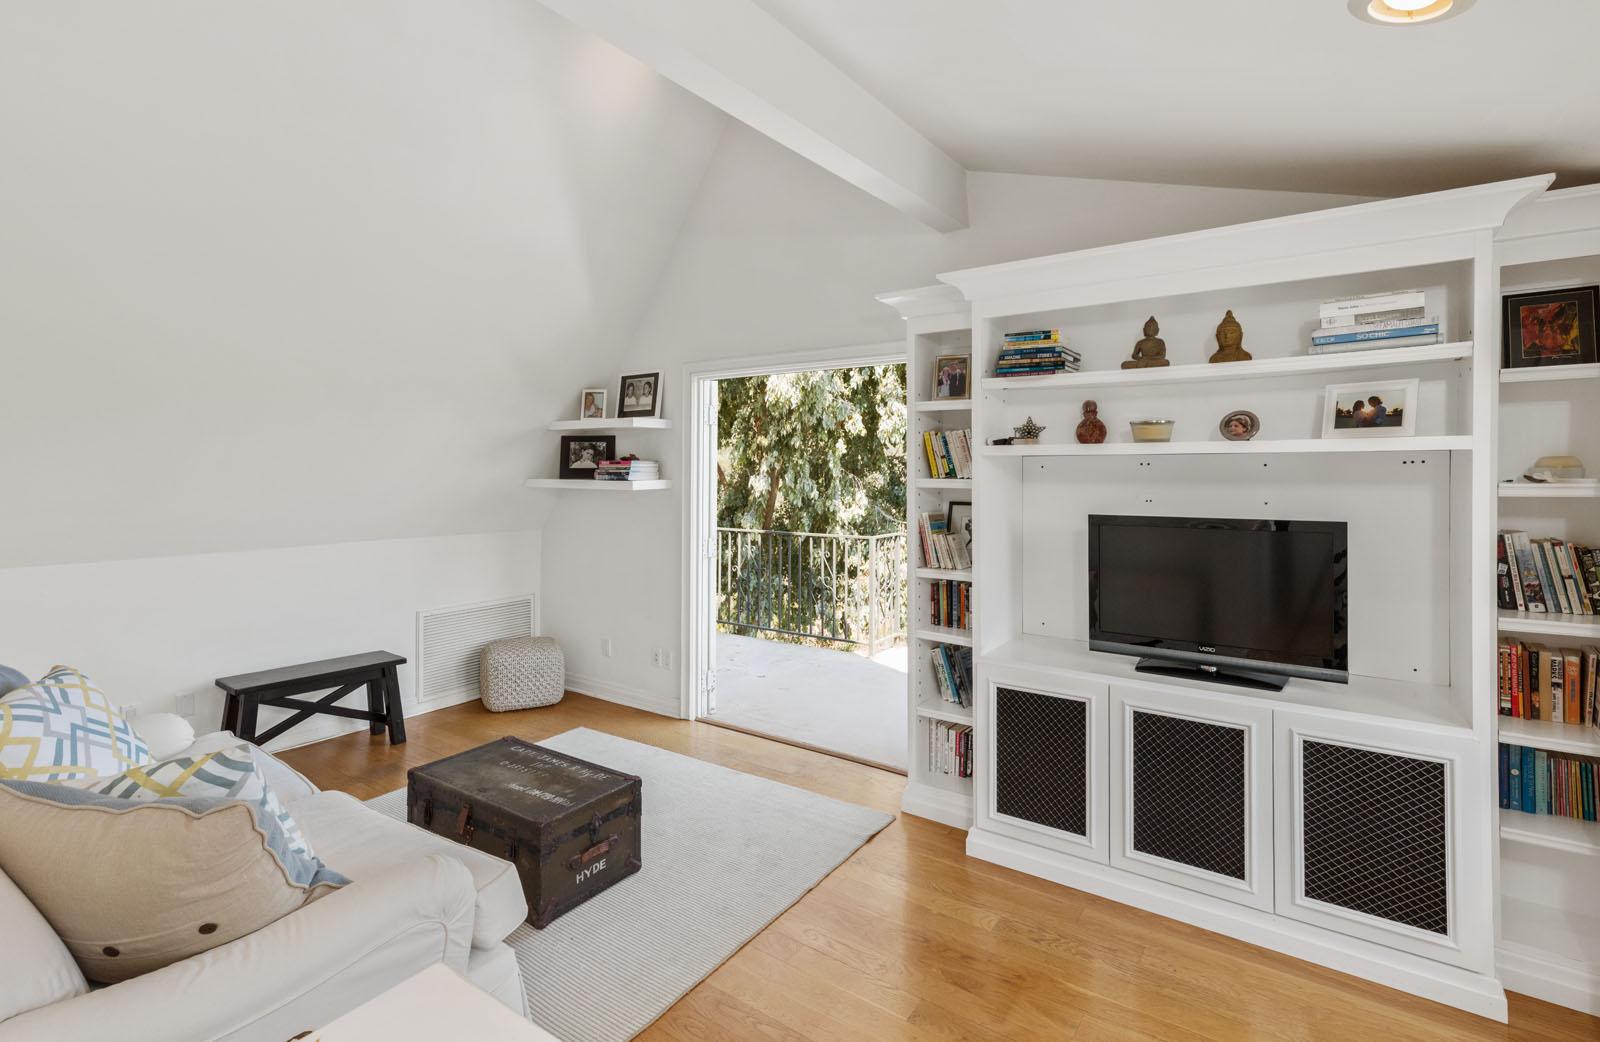 029 Loft 1712 Manzanita Park Avenue Malibu For Sale Lease The Malibu Life Team Luxury Real Estate.jpg